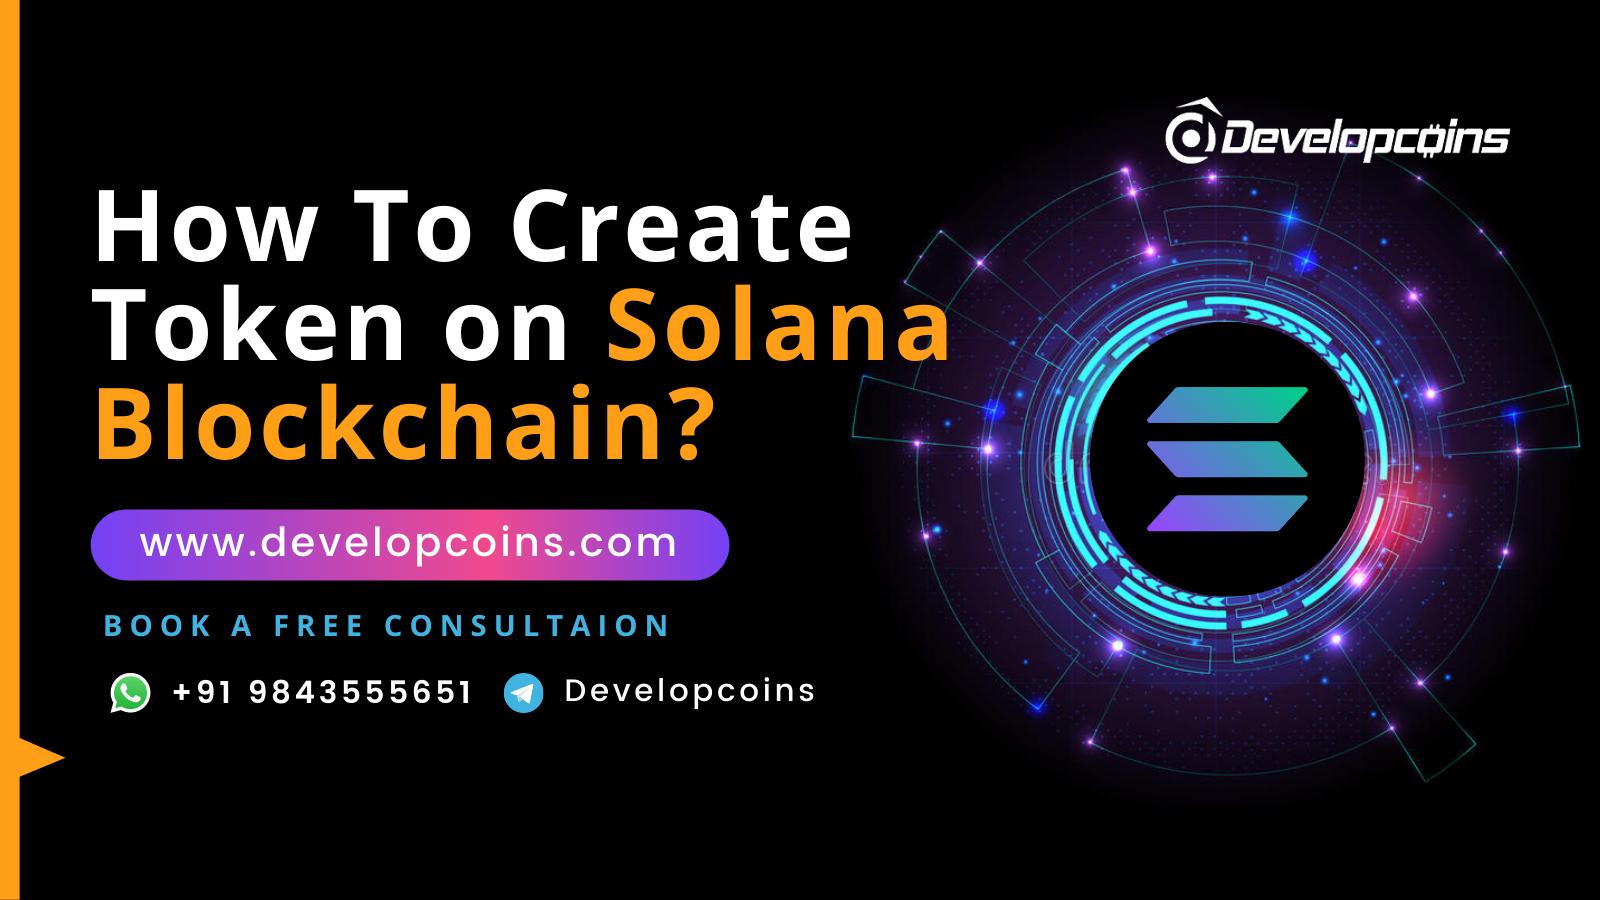 How To Create Token on The Solana Blockchain?